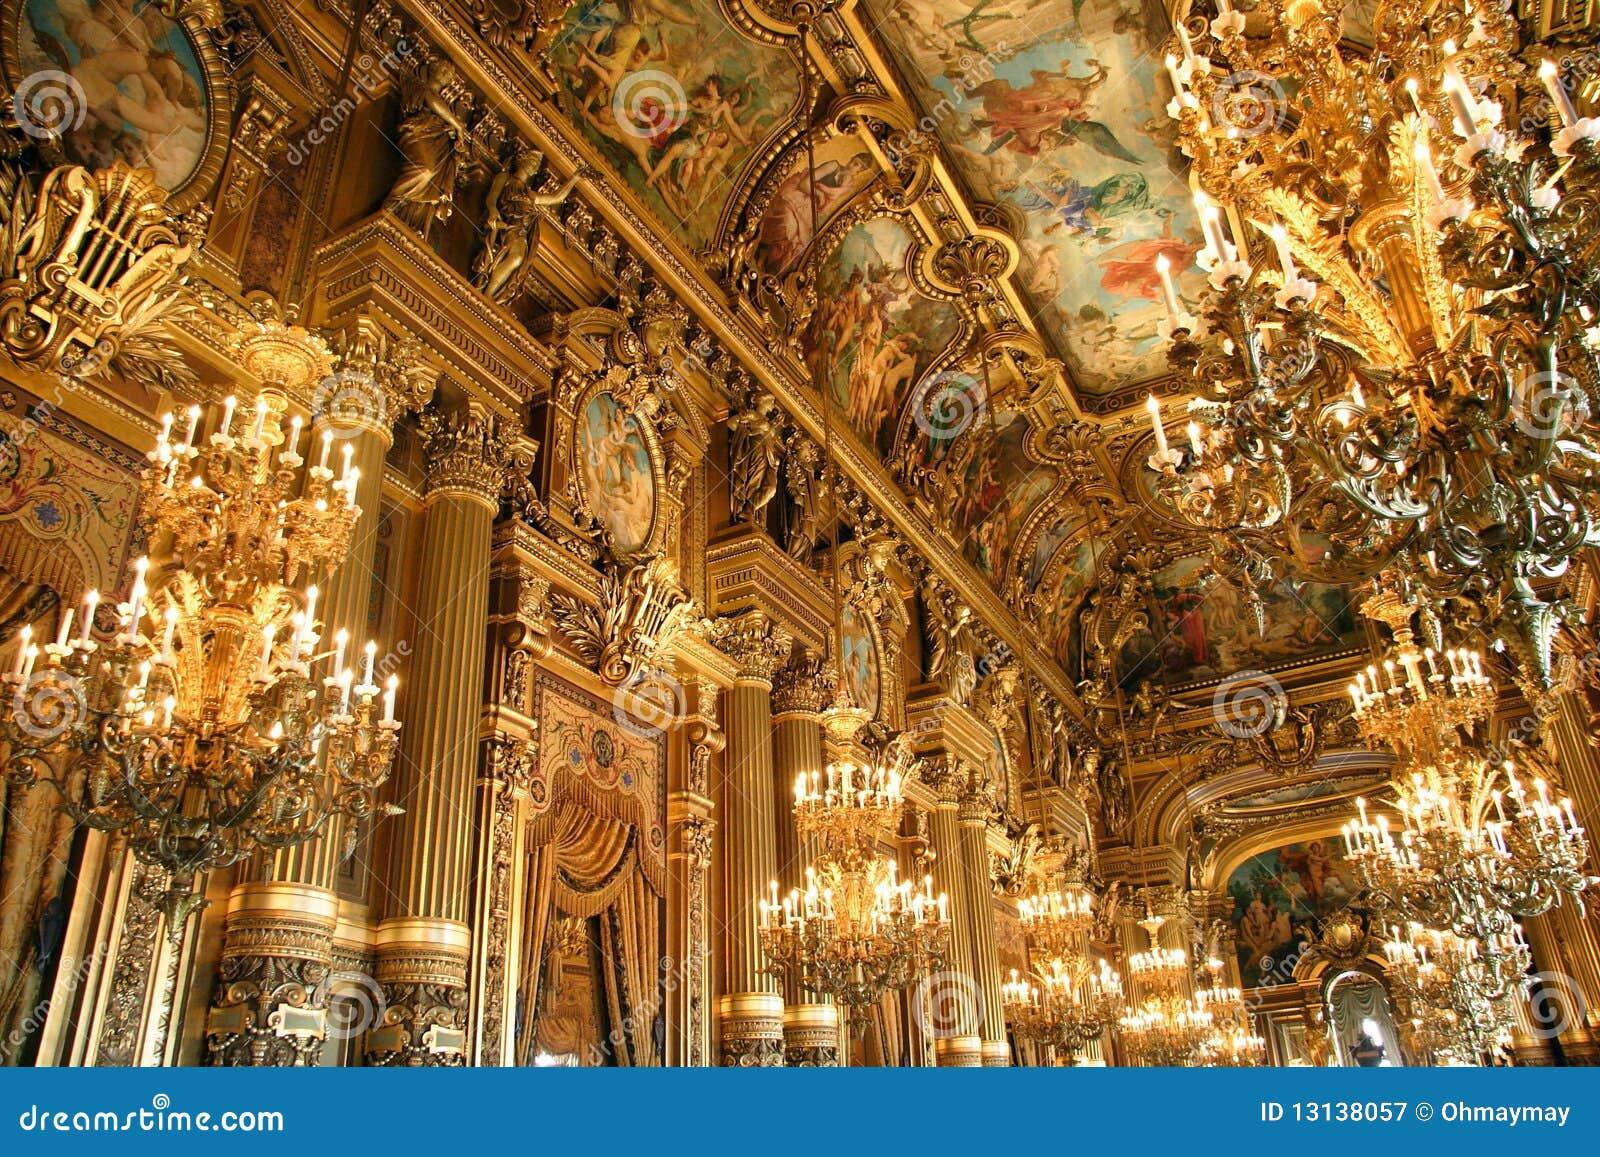 interior of opera garnier in paris stock image image 13138057. Black Bedroom Furniture Sets. Home Design Ideas